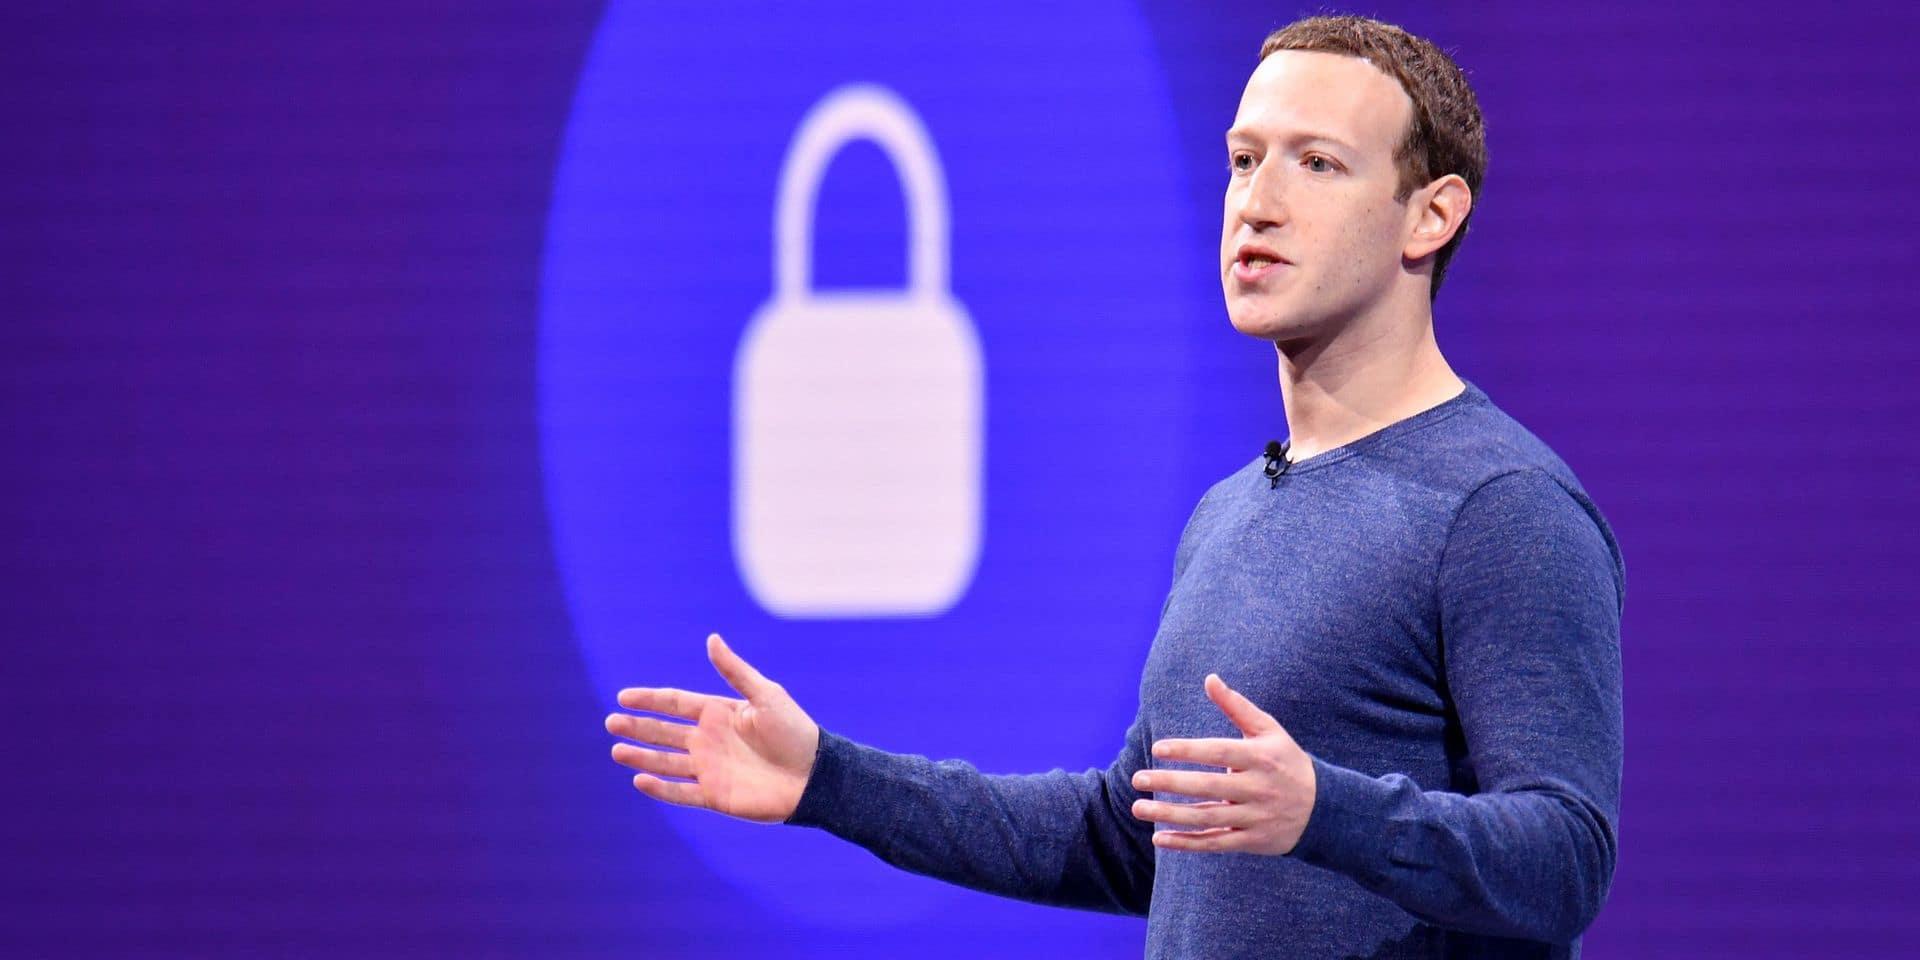 Facebook écope d'une amende de 5 milliards de dollars